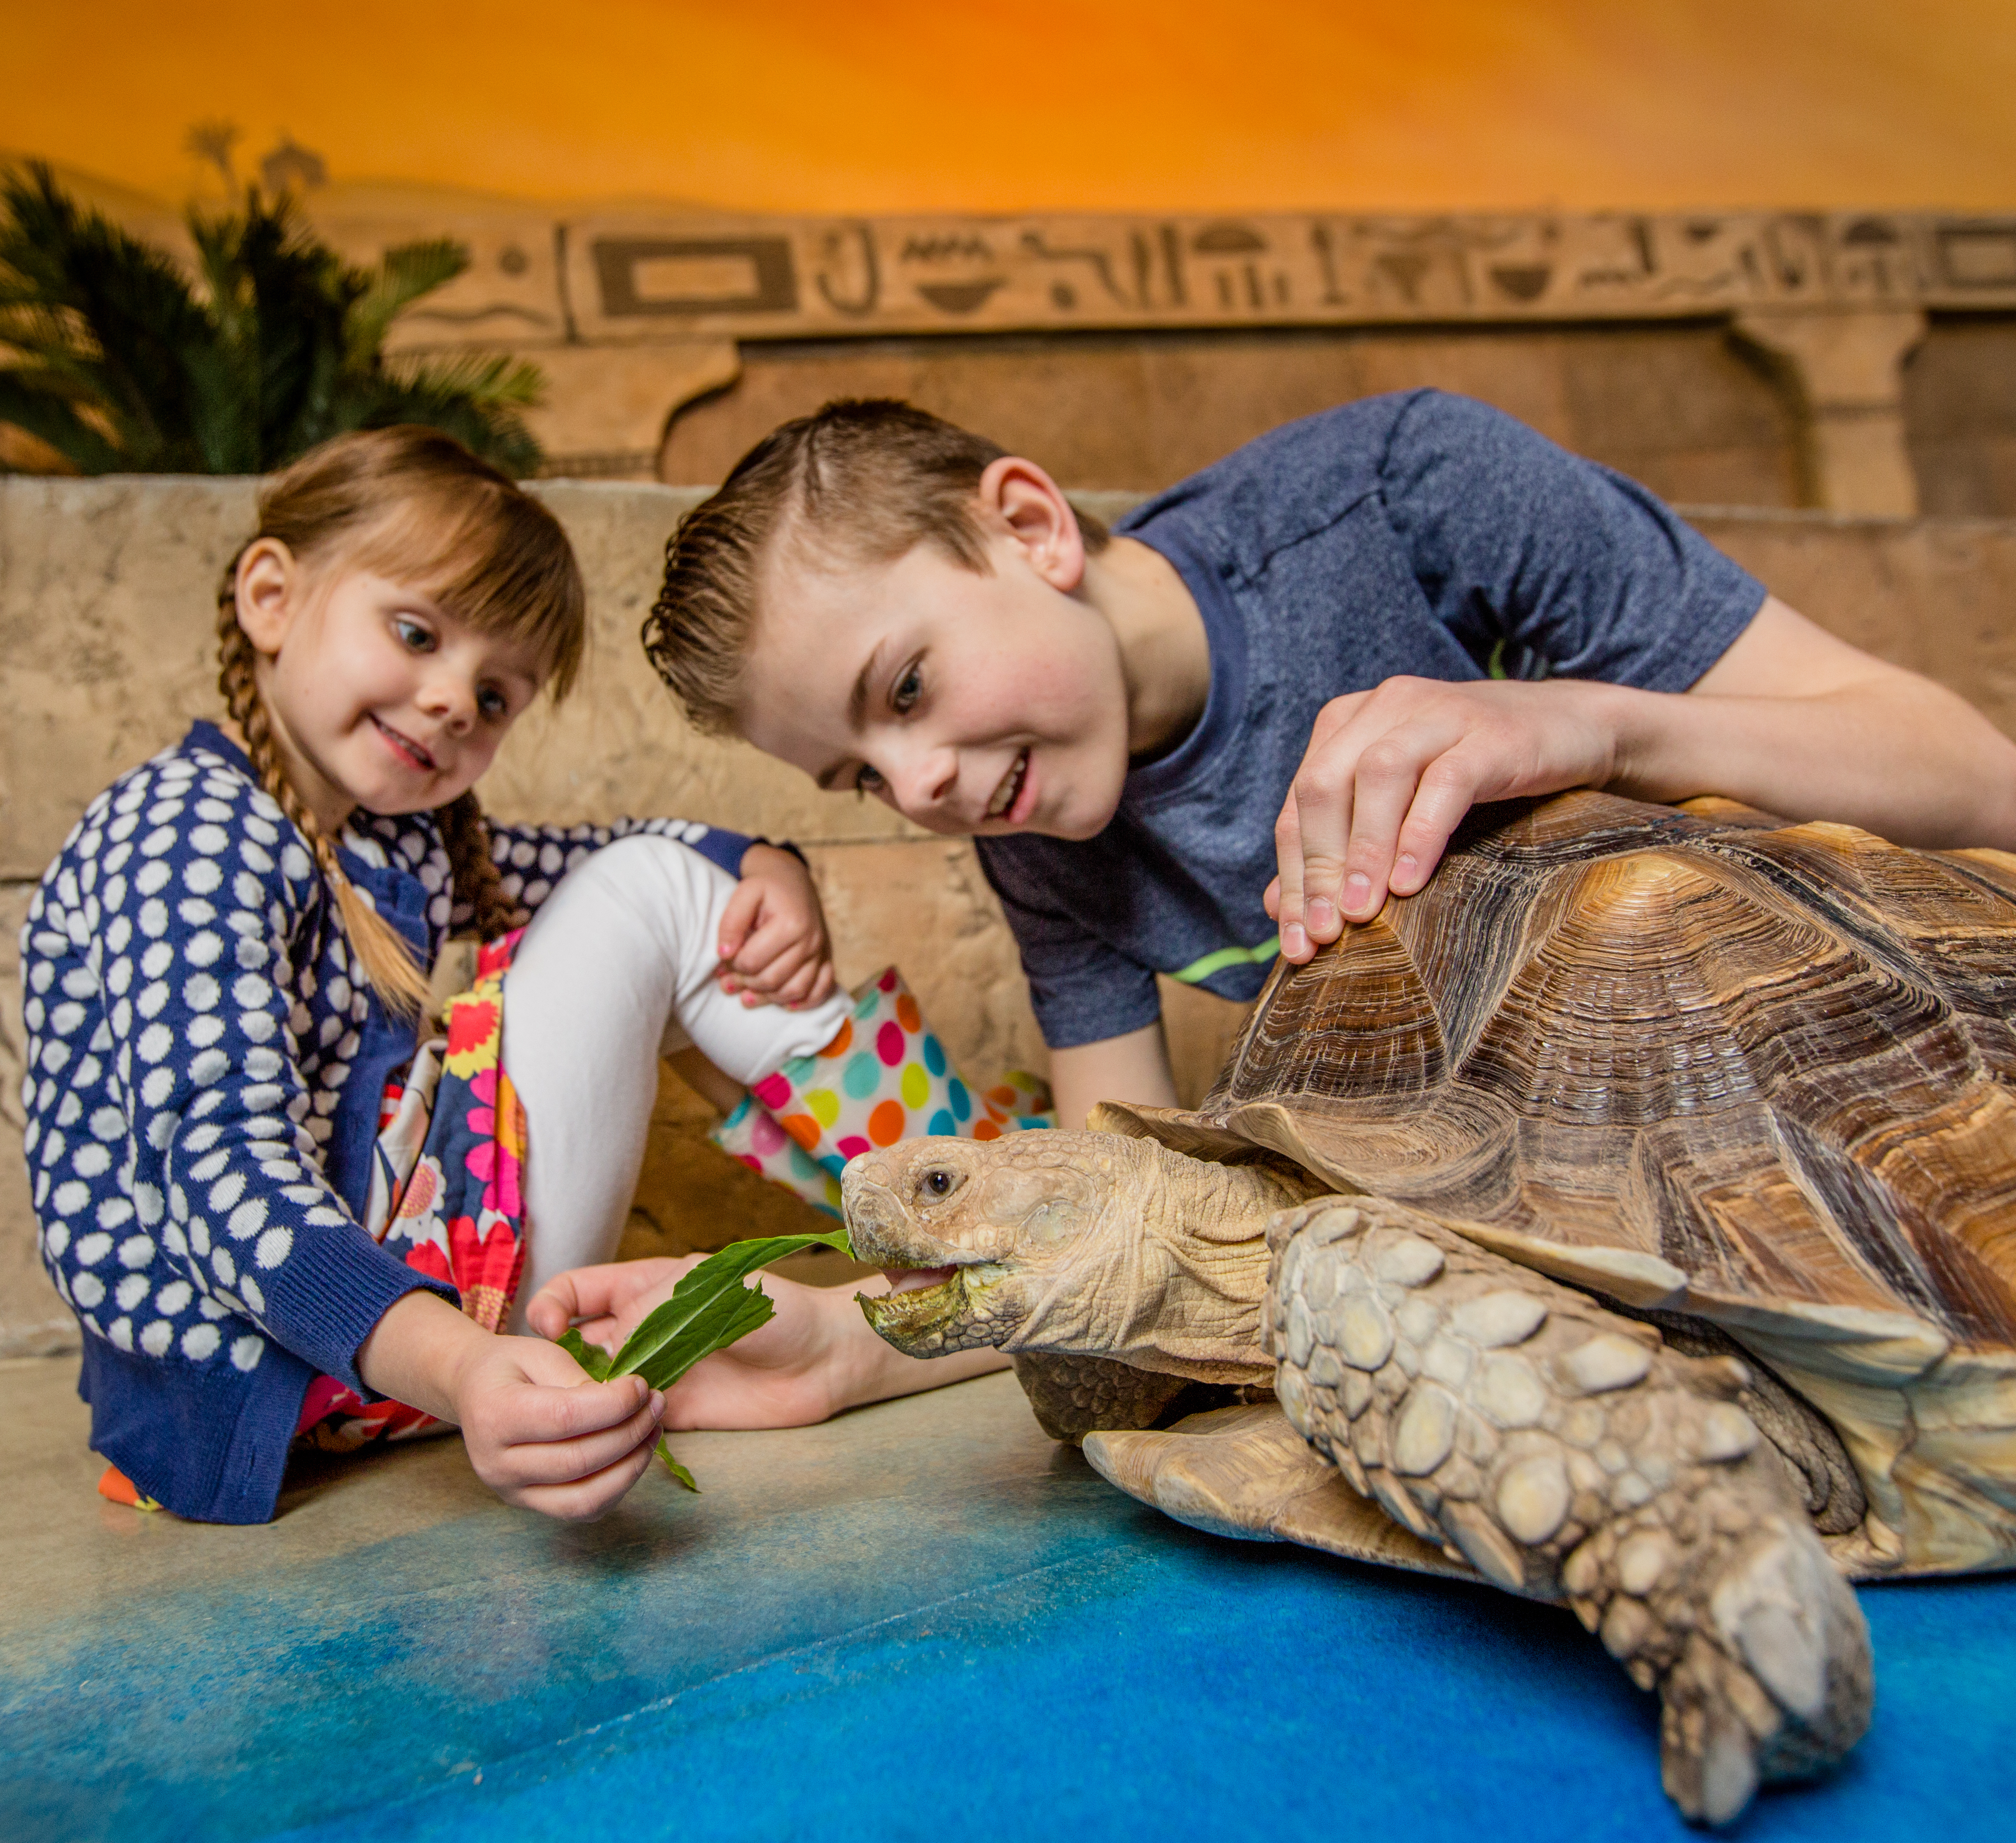 New Jersey is Getting a New Aquarium - NJ Family